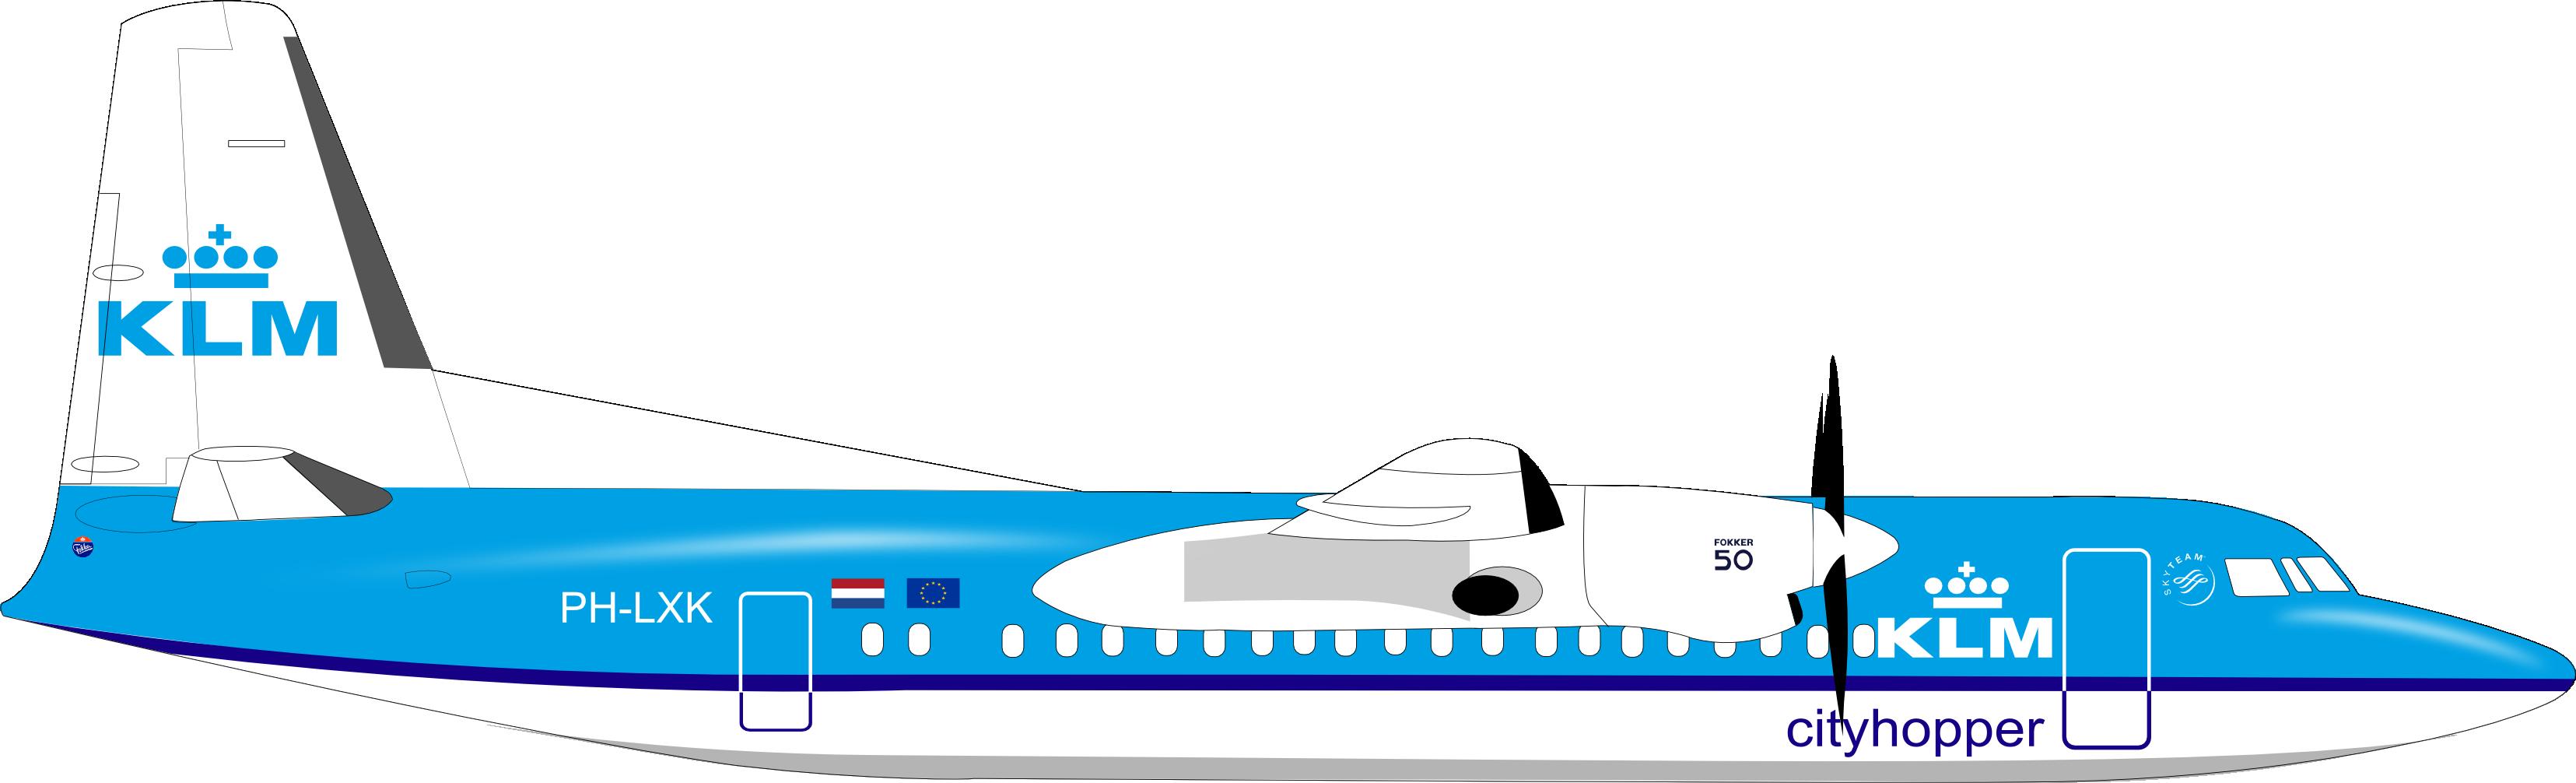 Resultado de imagen para KLM Fokker 50 png